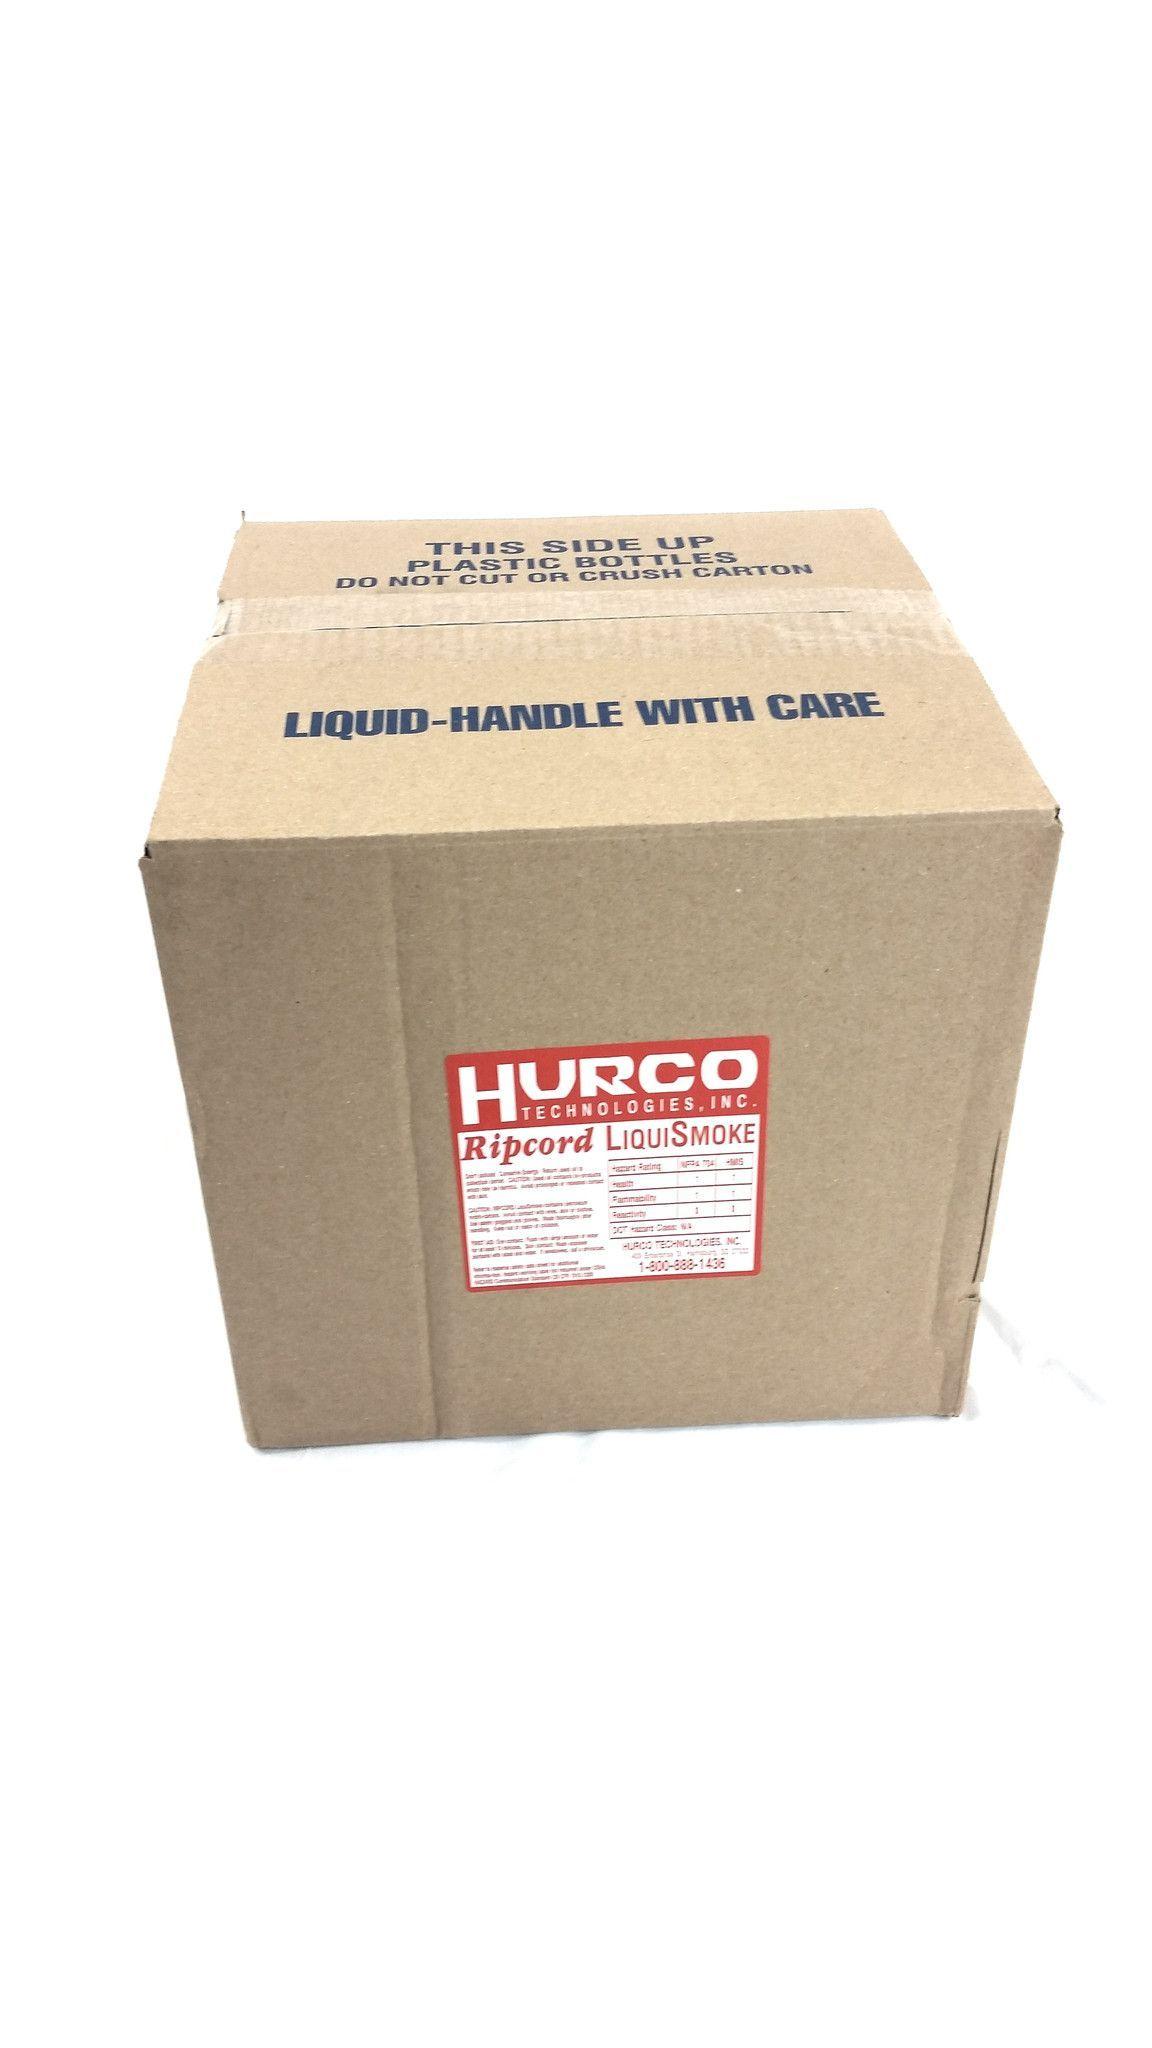 LiquiSmoke 1 Gallon Jugs Case of 4 Gallon, Hurco